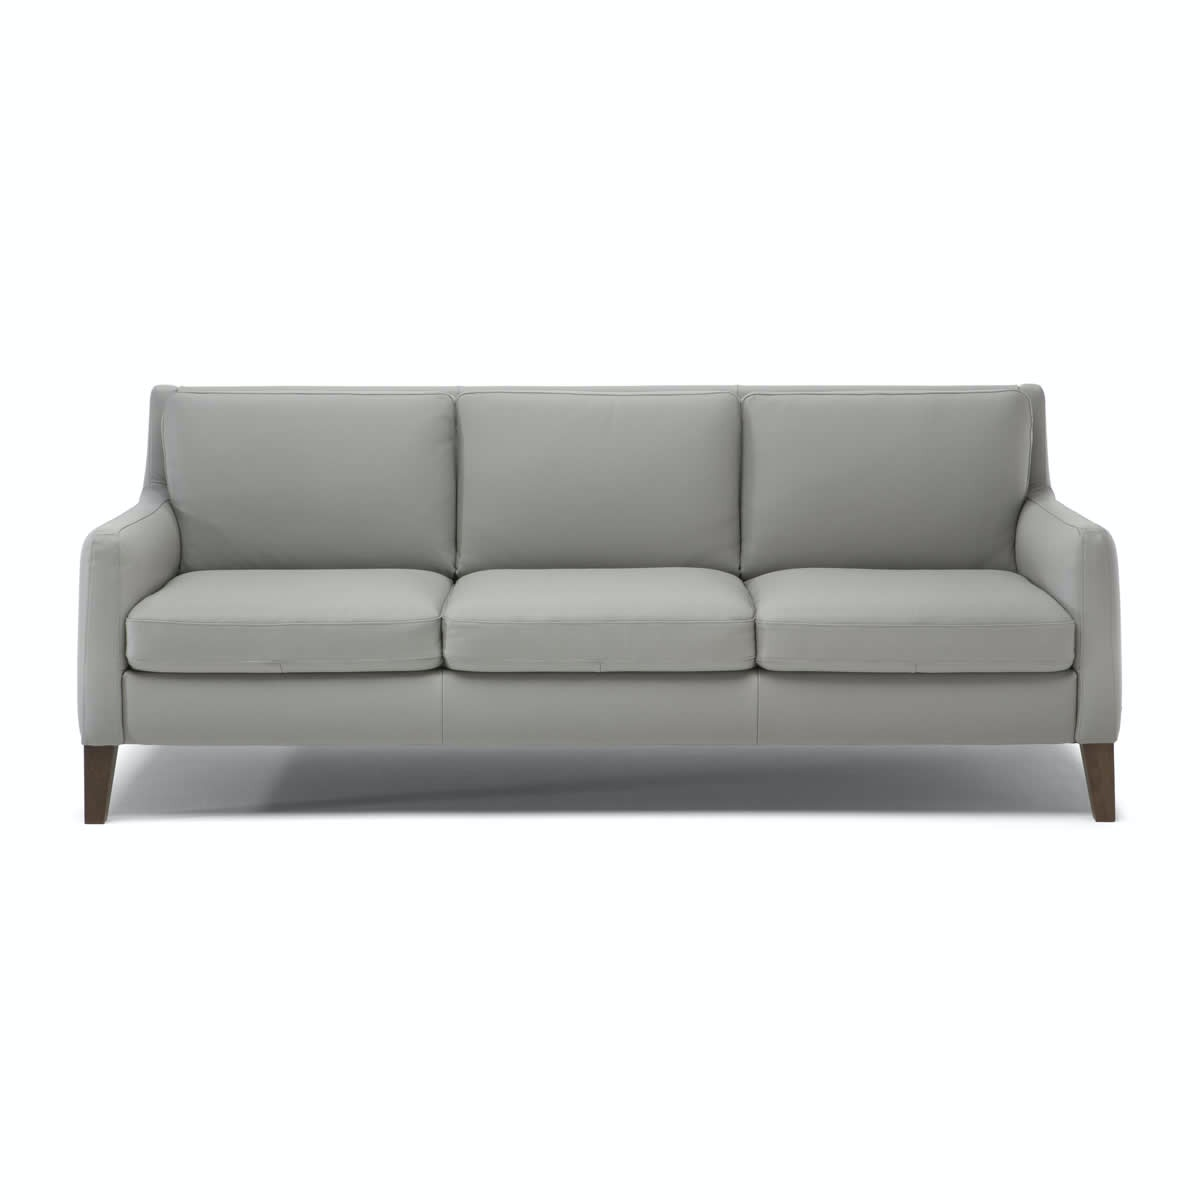 Attractive Natuzzi Editions Living Room C009 Three Seat Sofa C009 064 At Hamilton Sofa  U0026 Leather Gallery